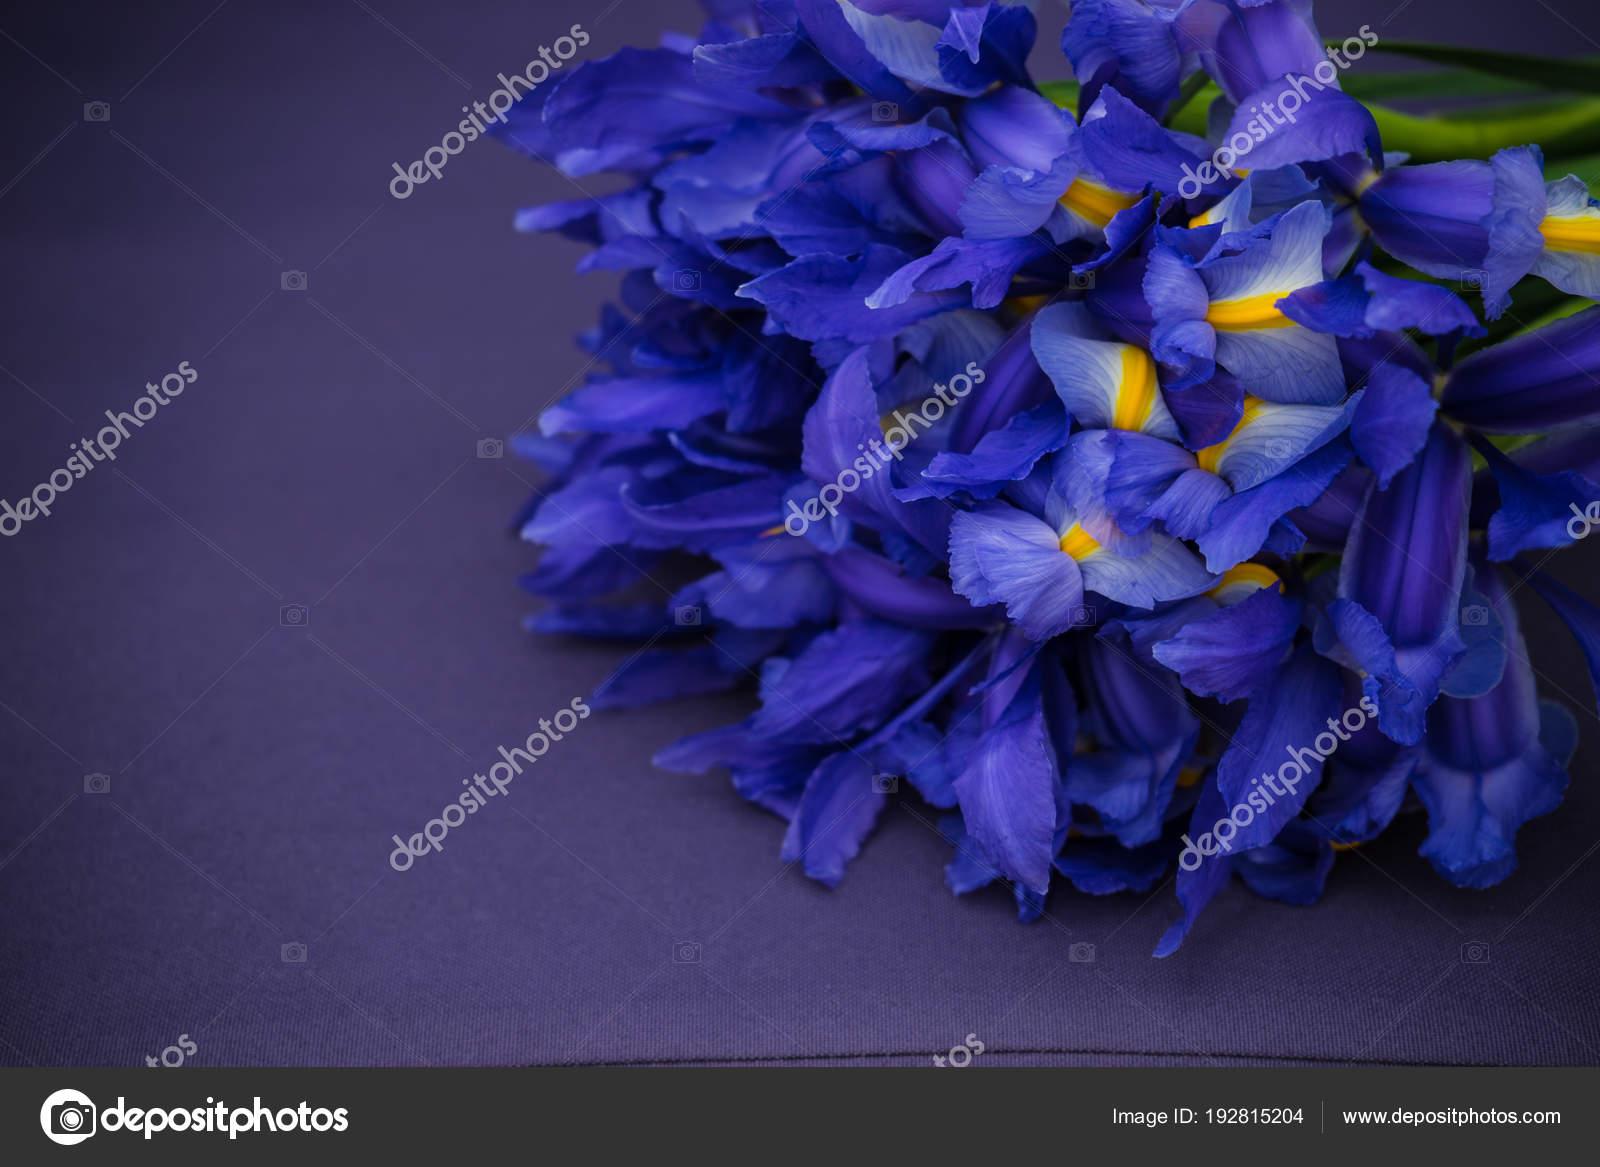 Beautiful blue iris flowers in a bouquet stock photo elet1 beautiful blue iris flowers in a bouquet stock photo izmirmasajfo